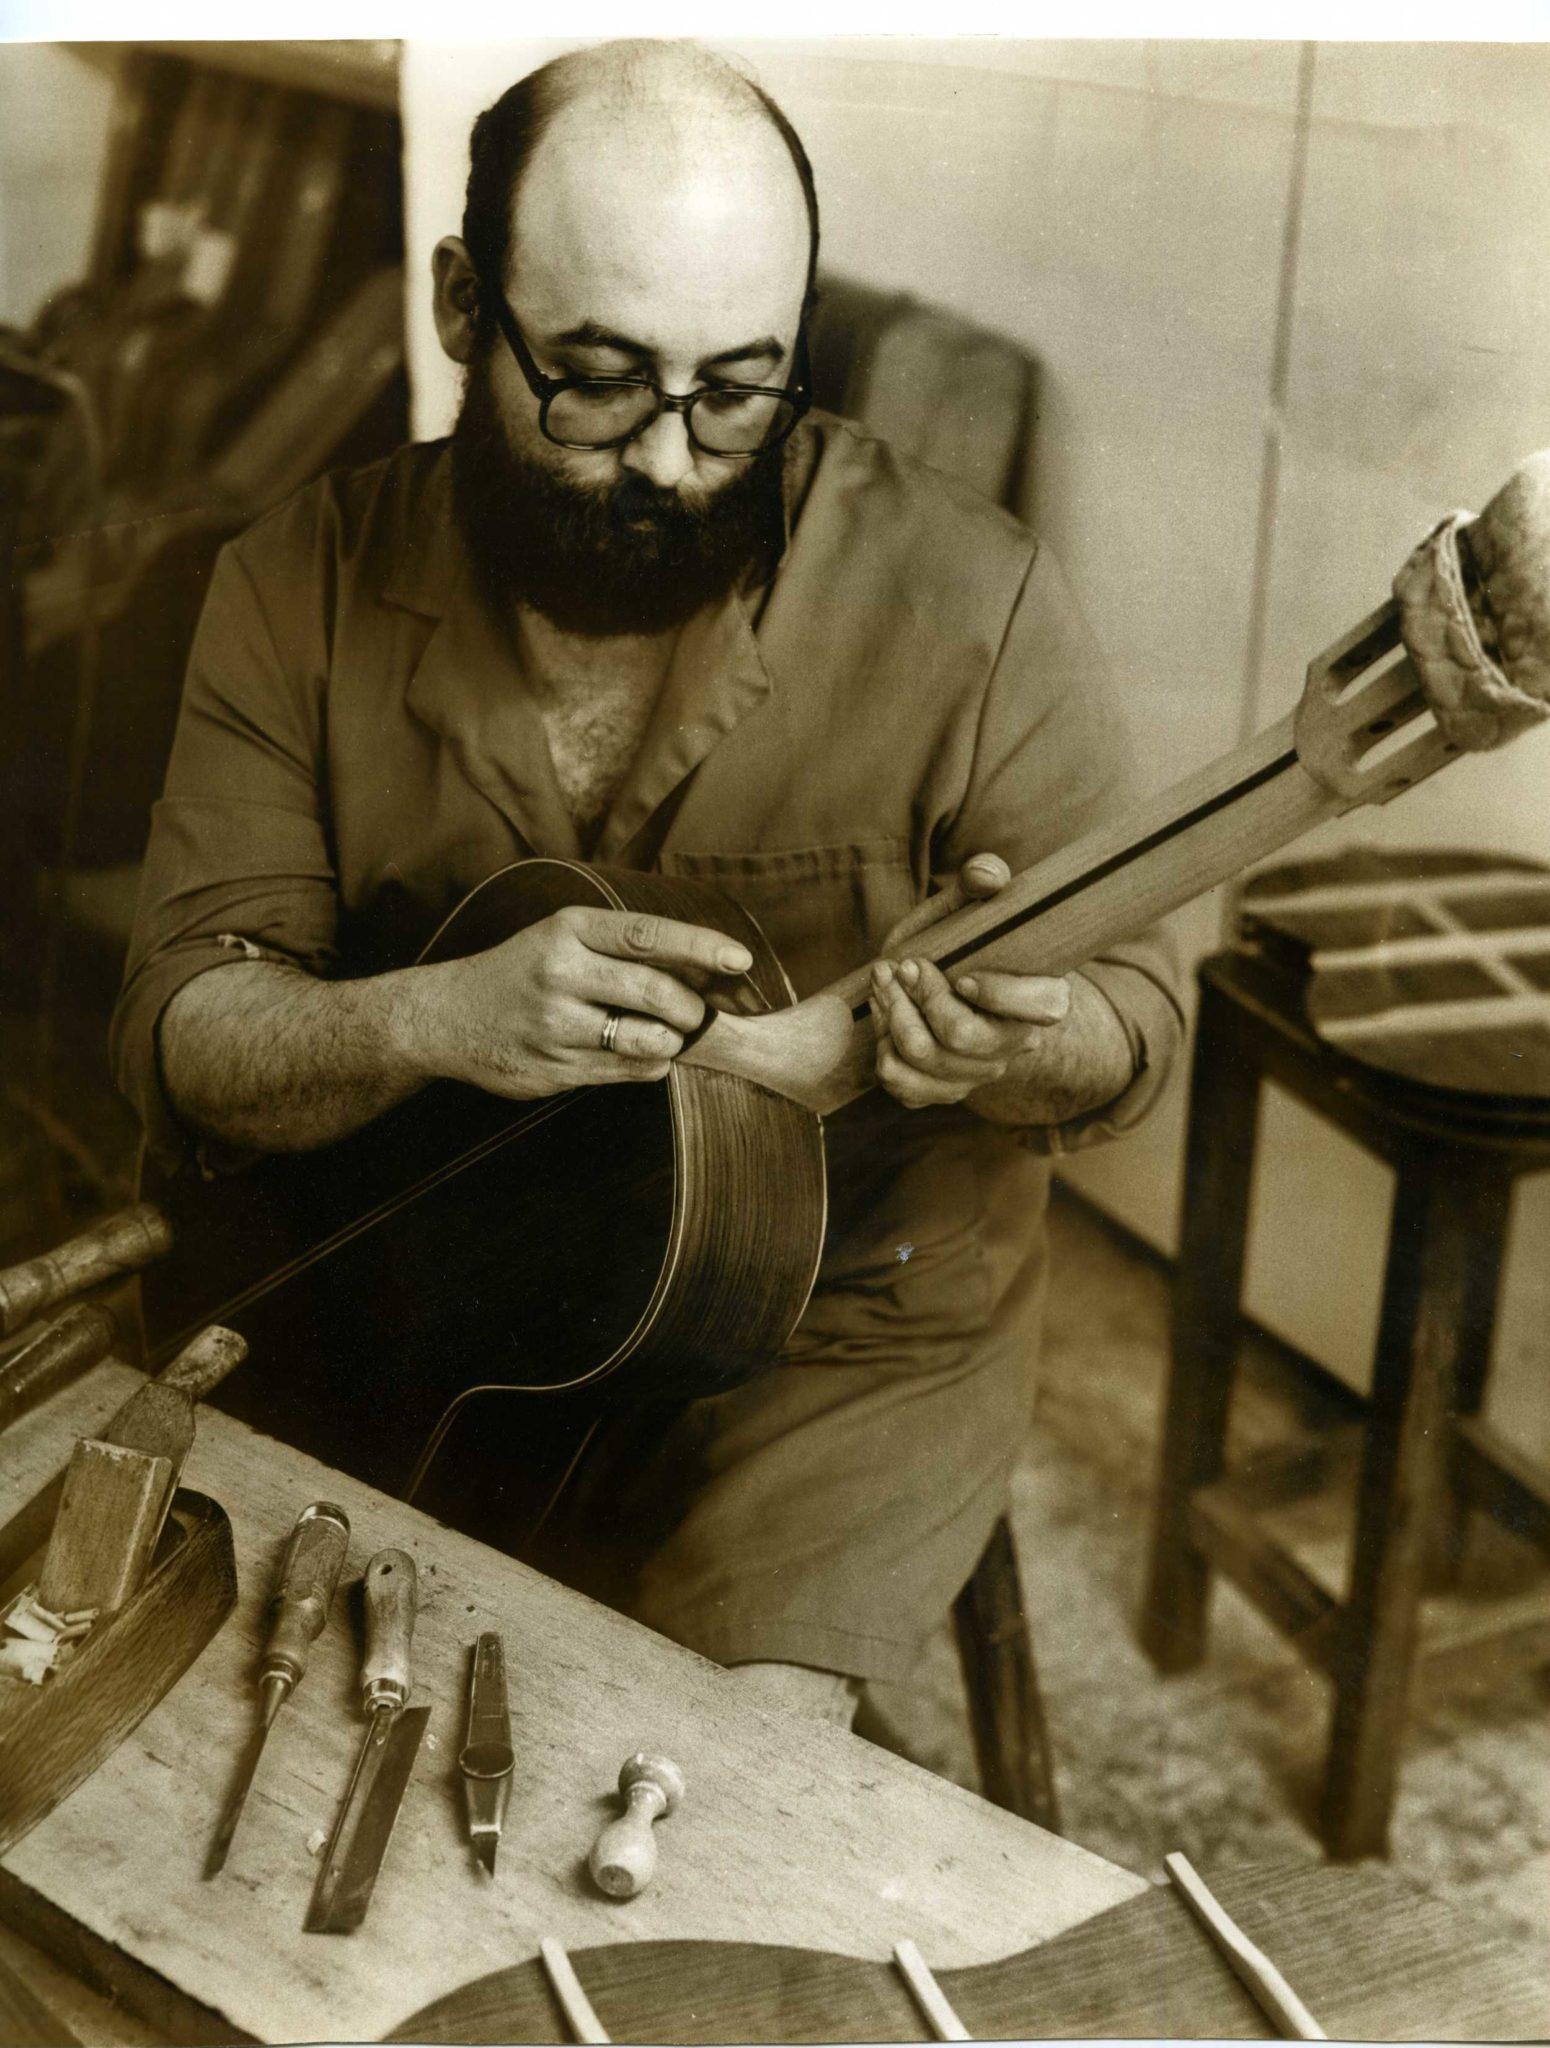 Jose-Ramirez-IV-trabajando-grande